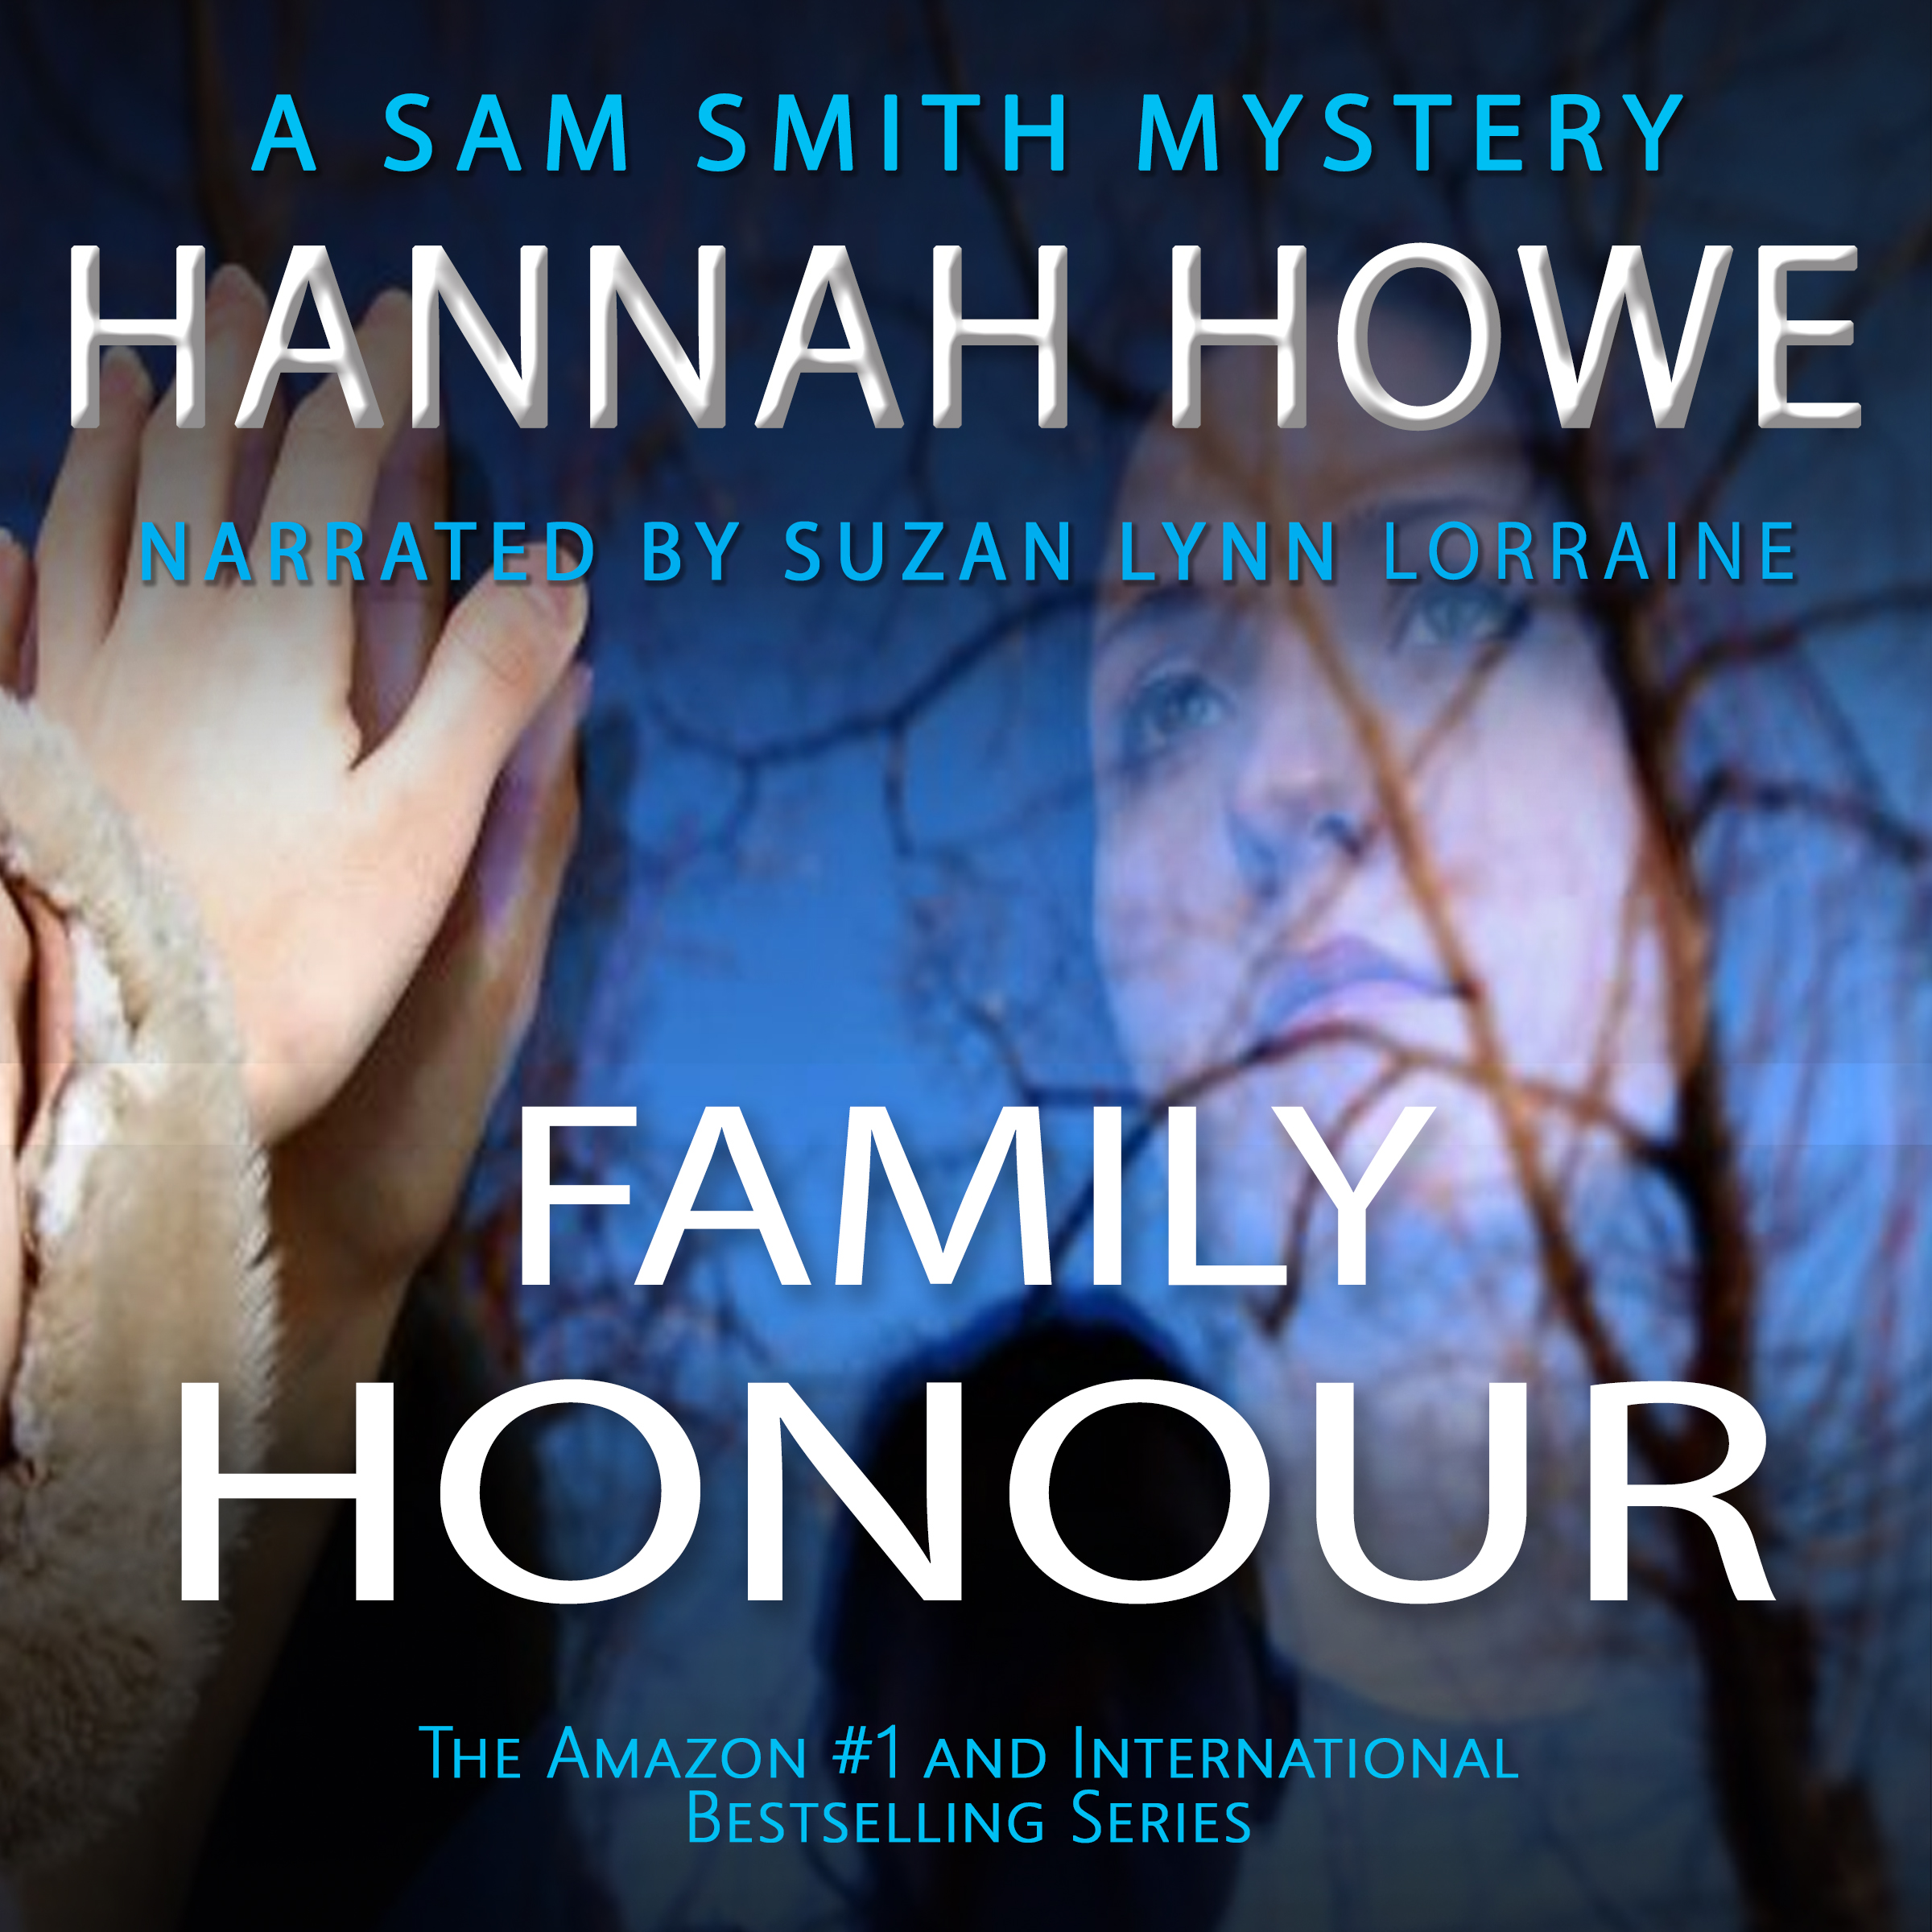 FAMILY HONOUR AUDIO BOOK